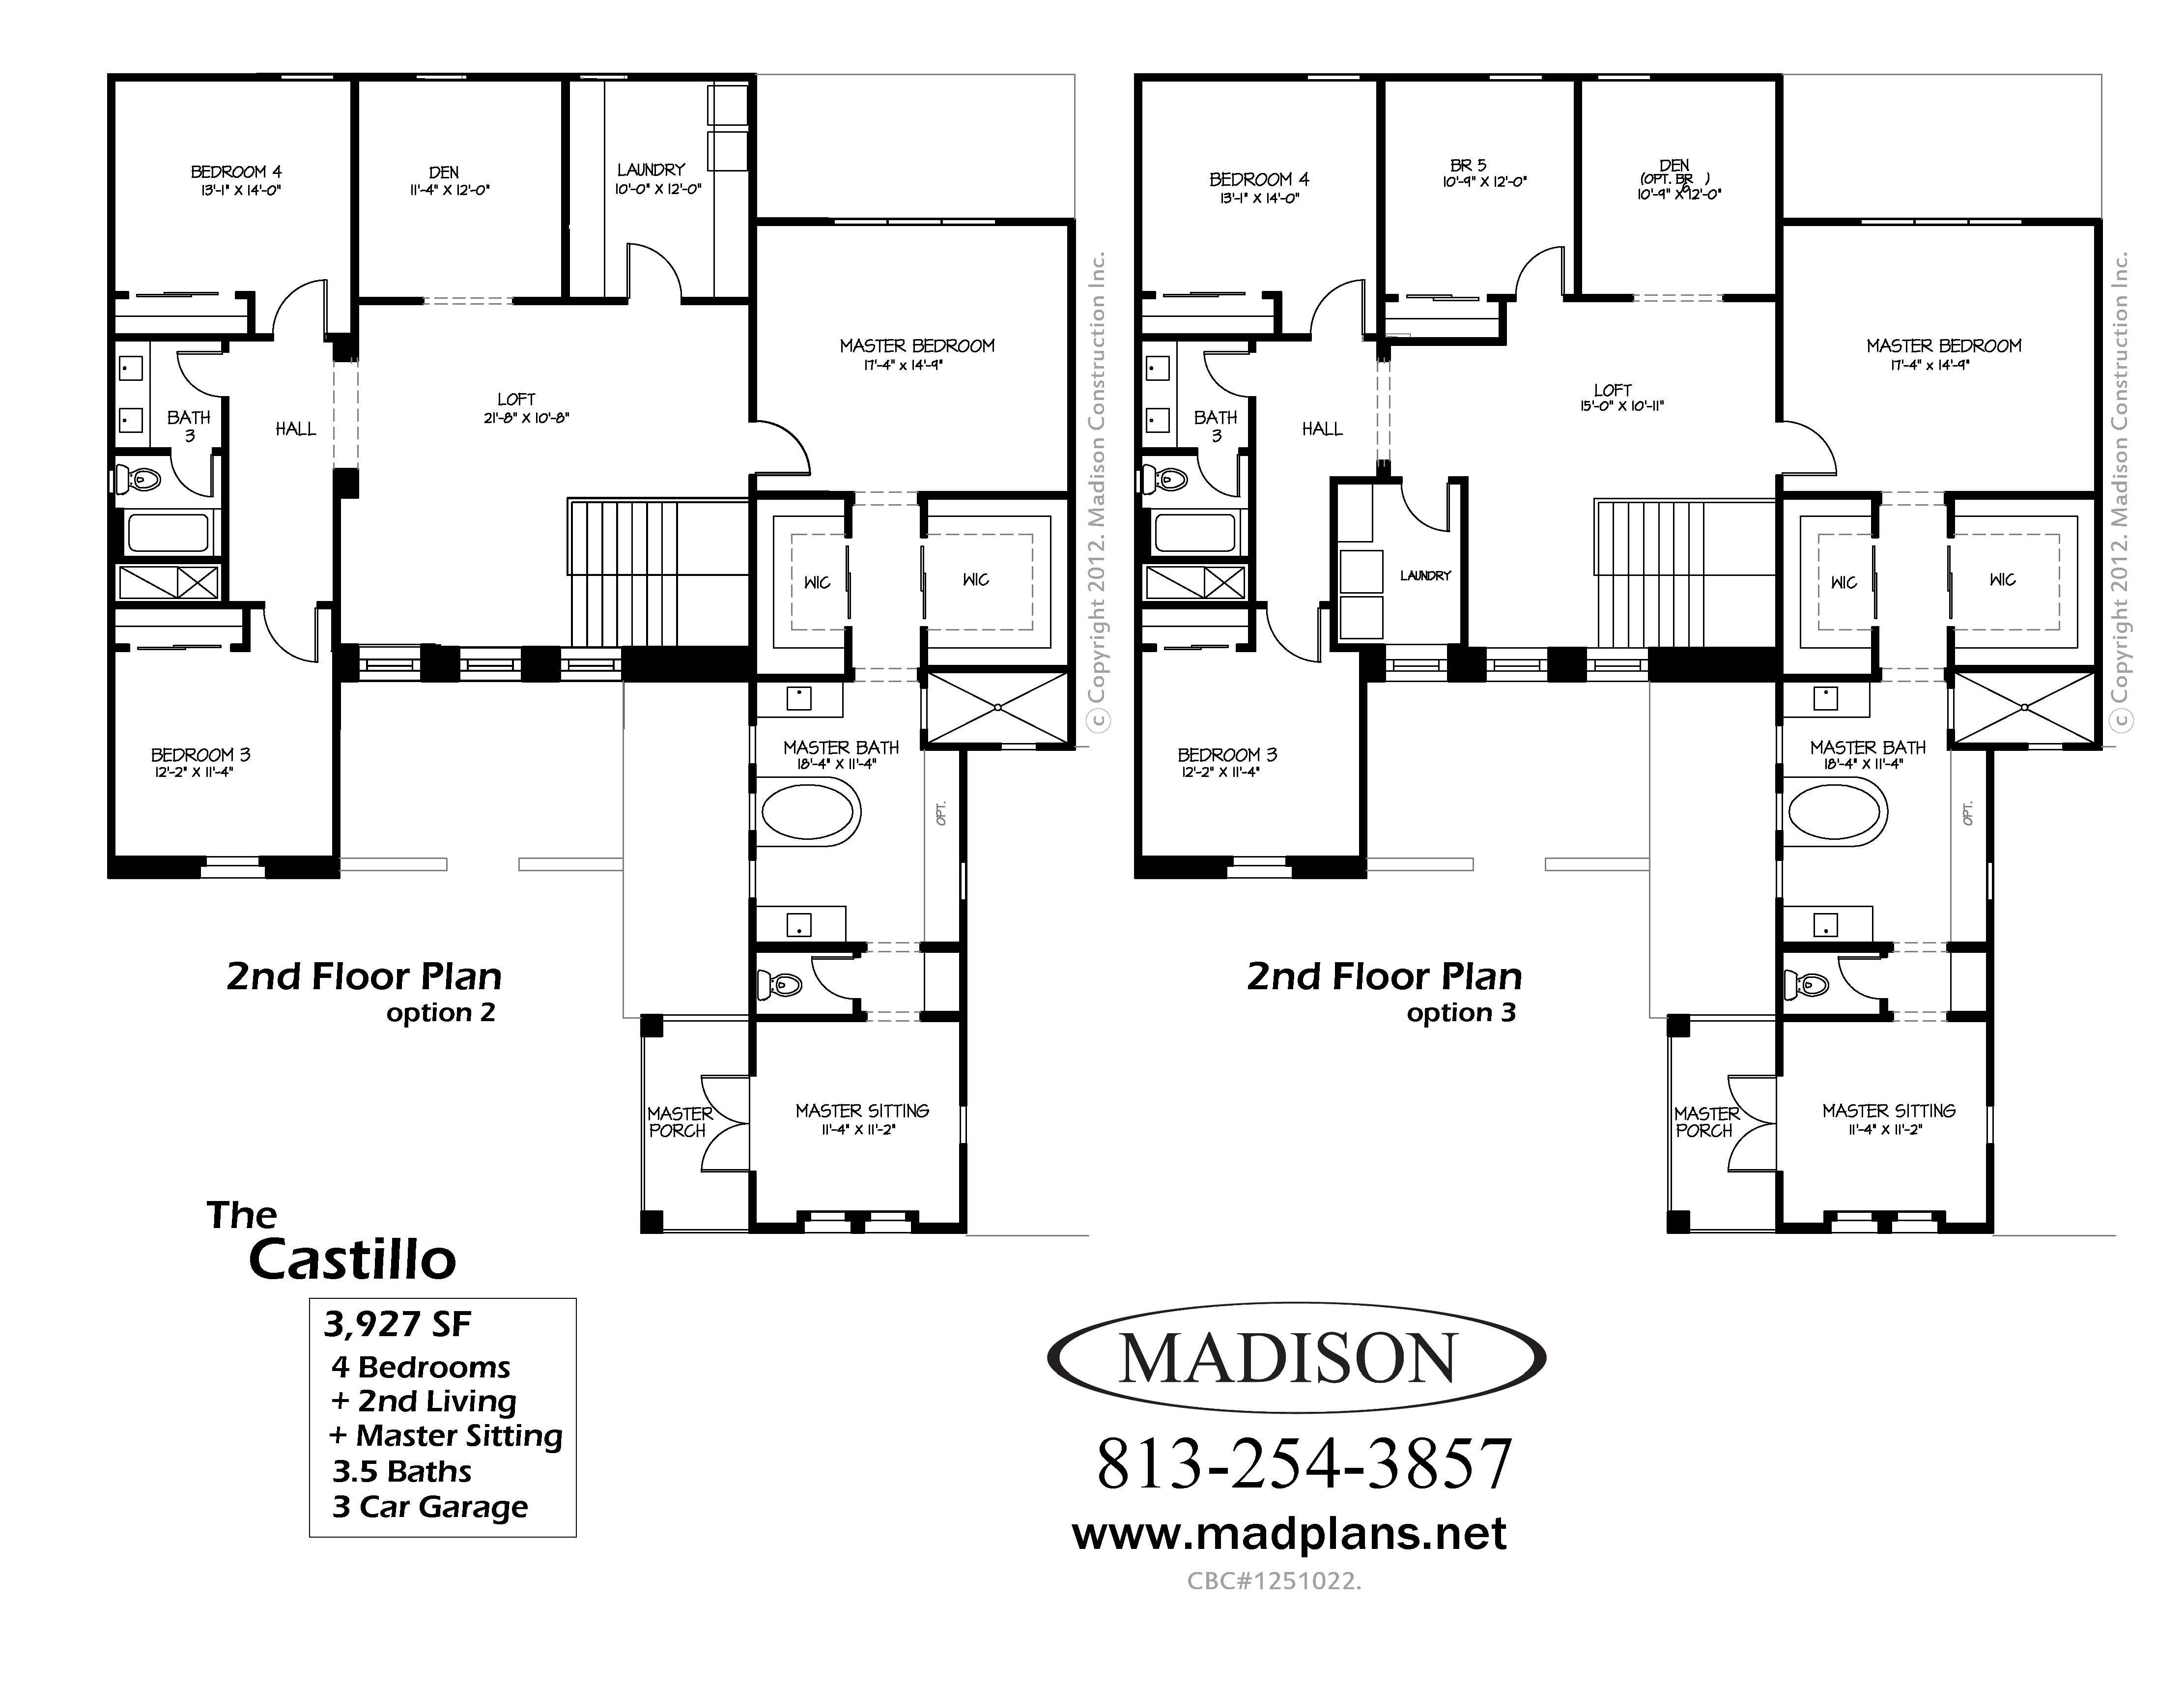 Madison Homes The Castillofloor Plans